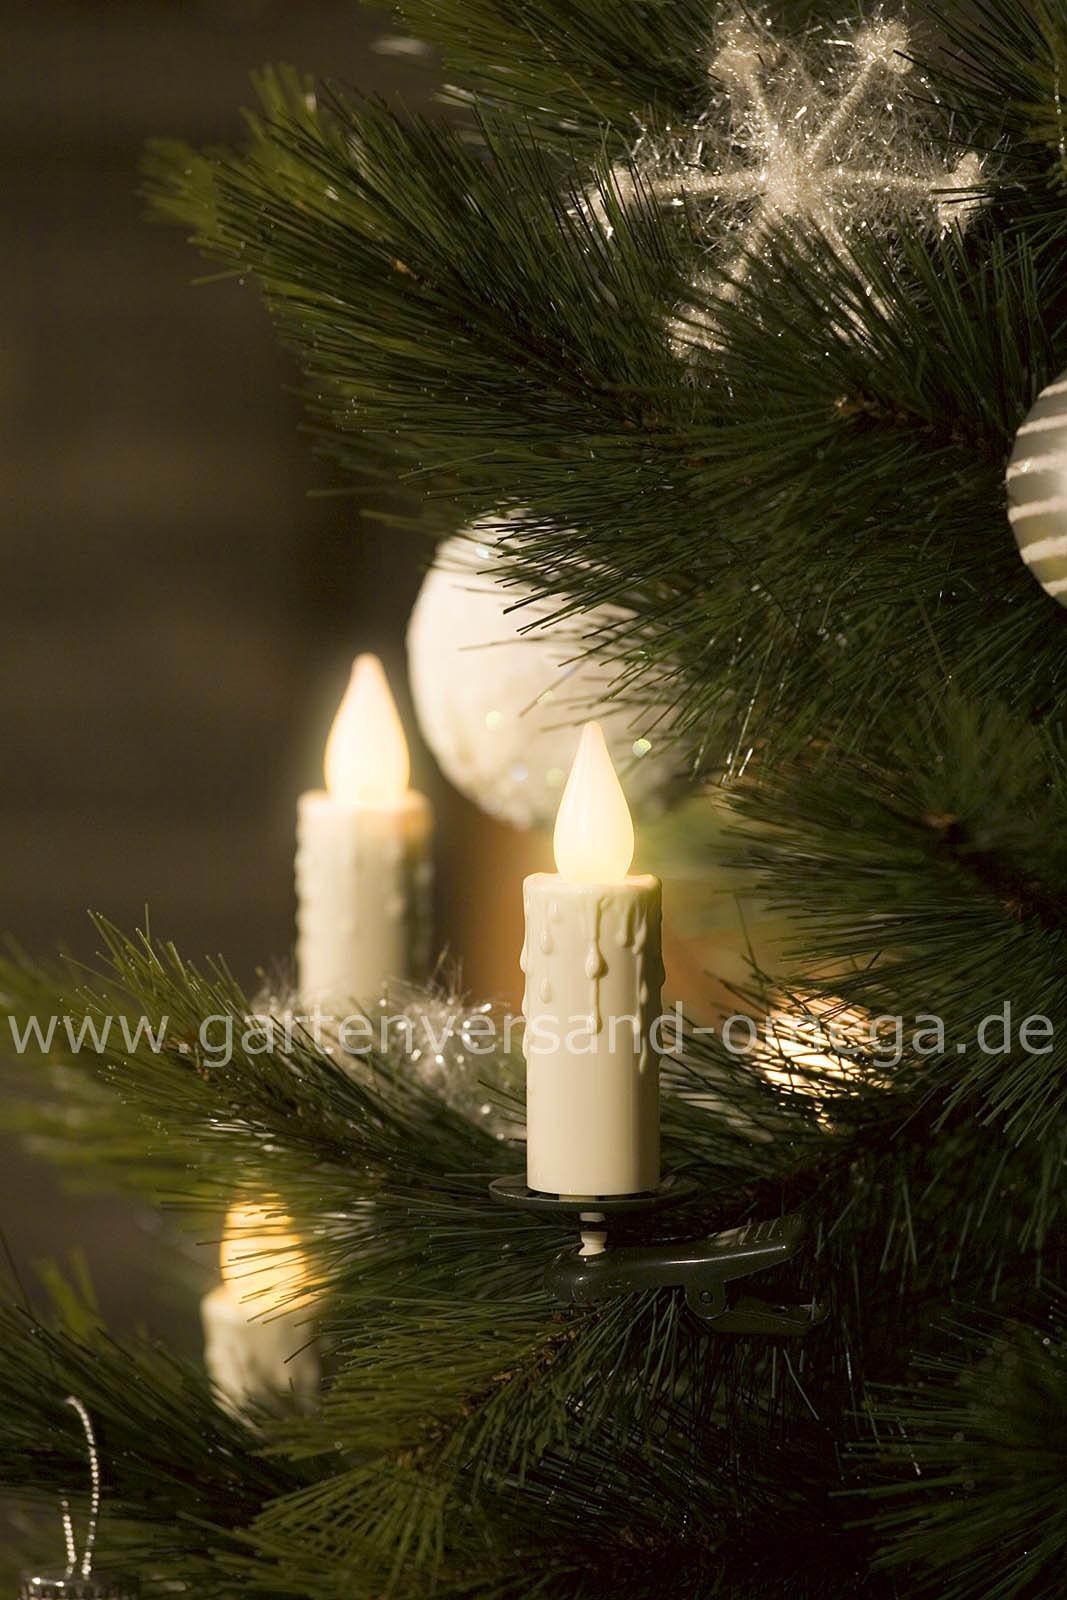 Kabellose weihnachtsbeleuchtung my blog for Led lichterkette kabellos test